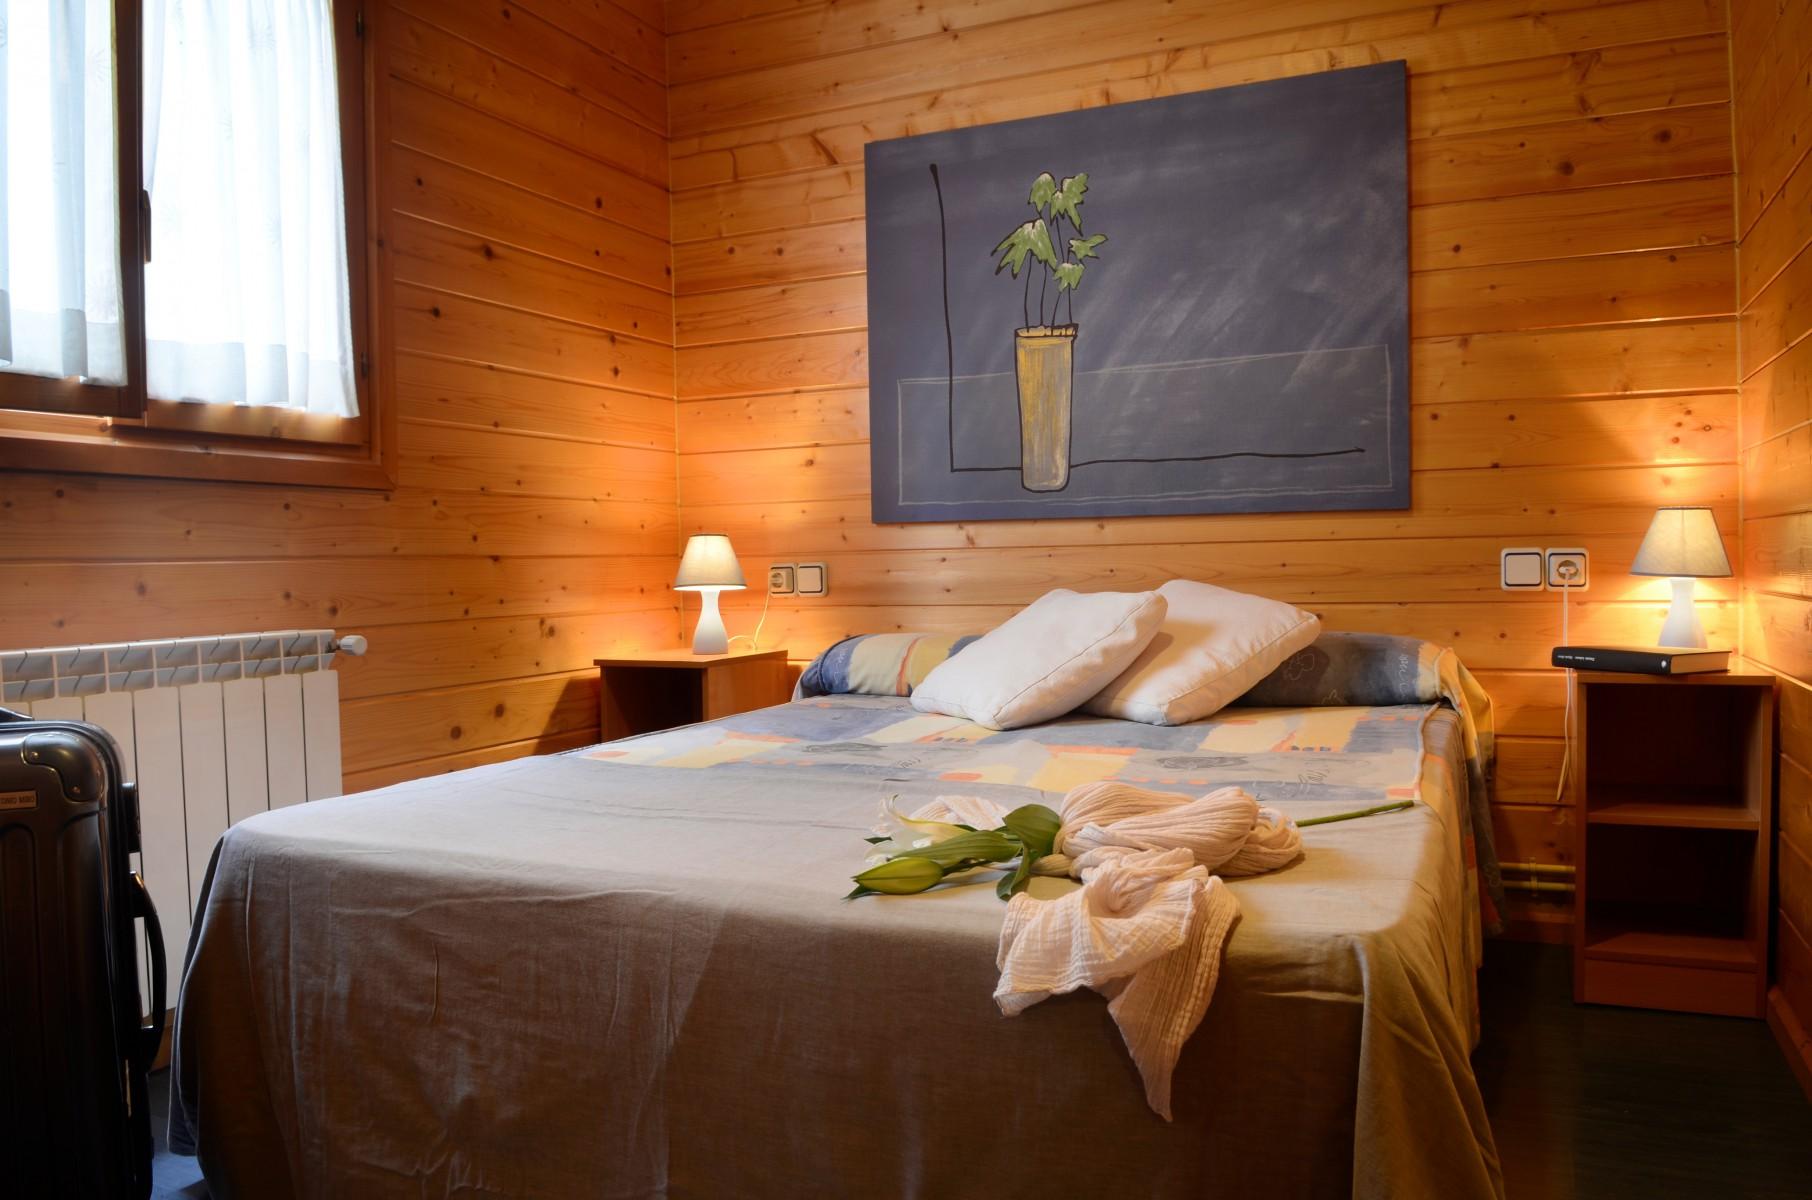 lodgings - baliera, camping caravaning bungalows - bonansa (huesca)